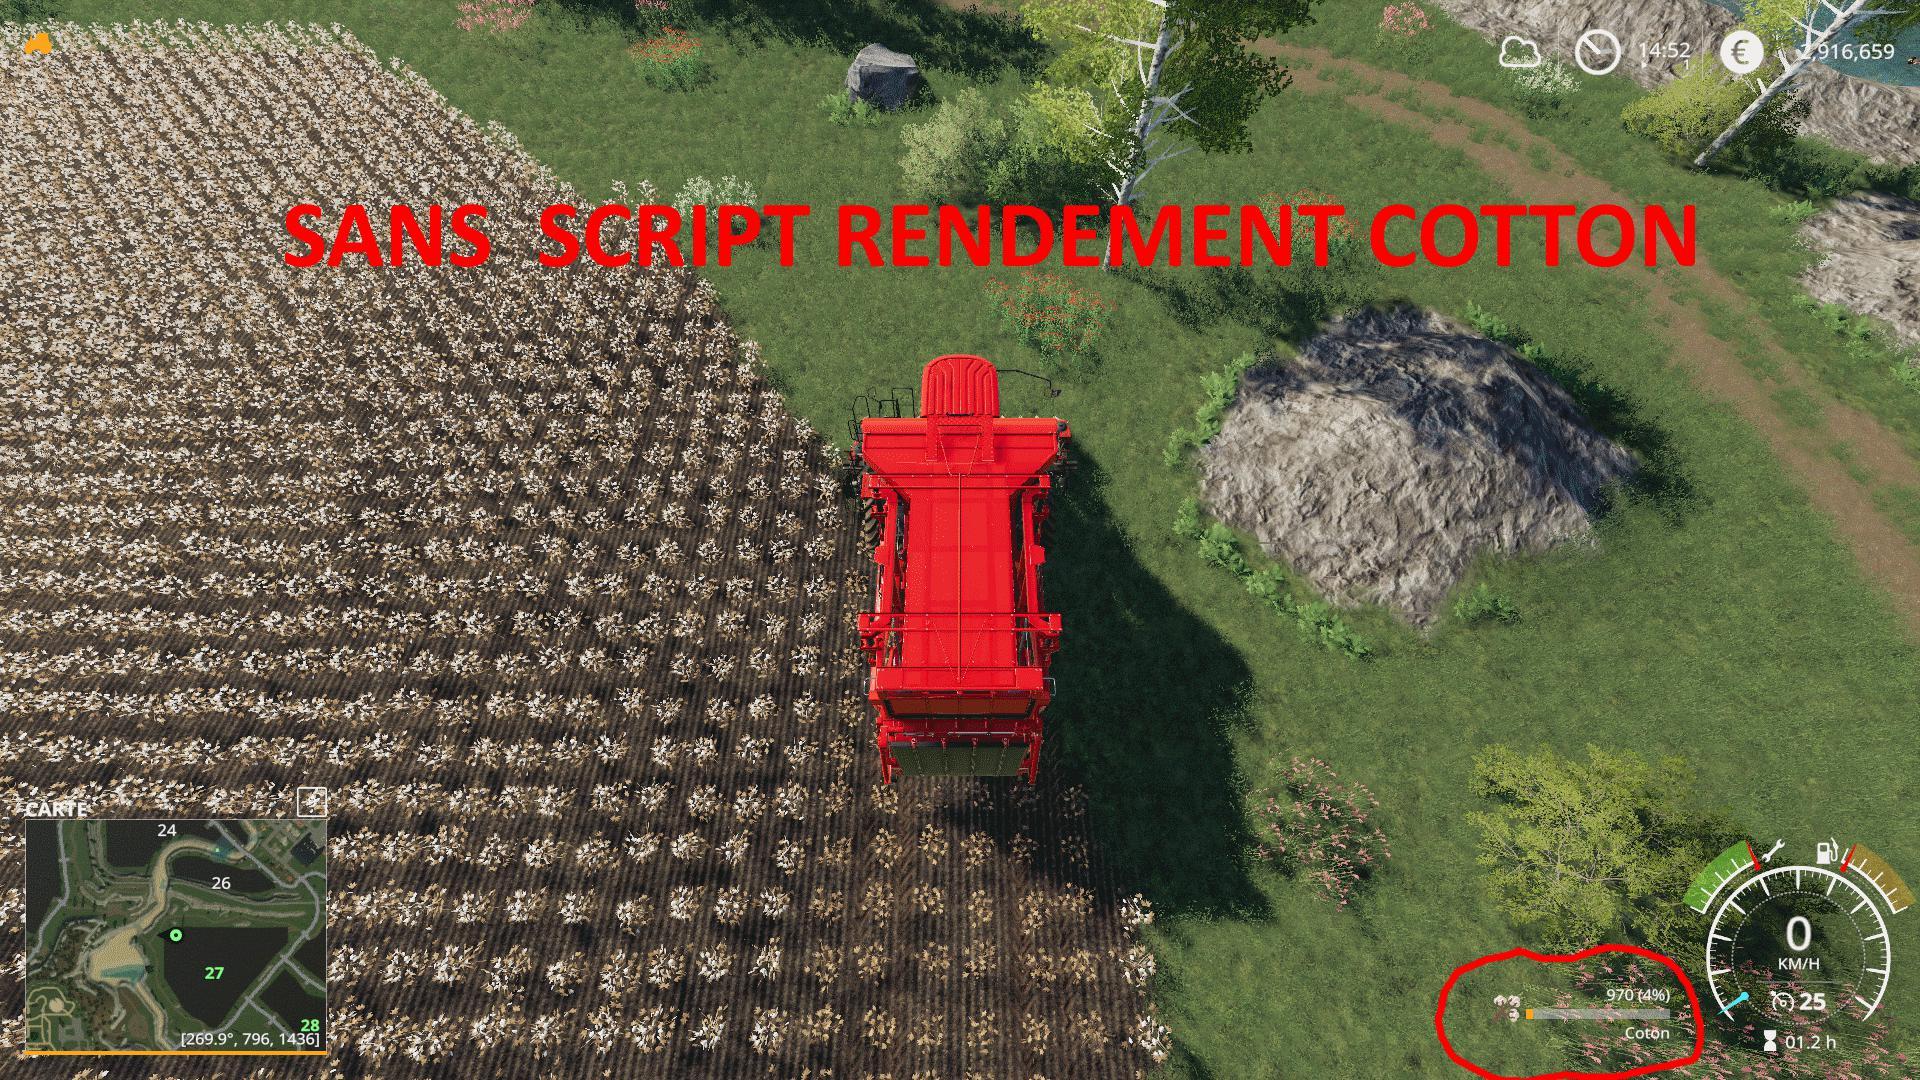 Rendement cotton v 1 0   FS19 mods, Farming simulator 19 mods